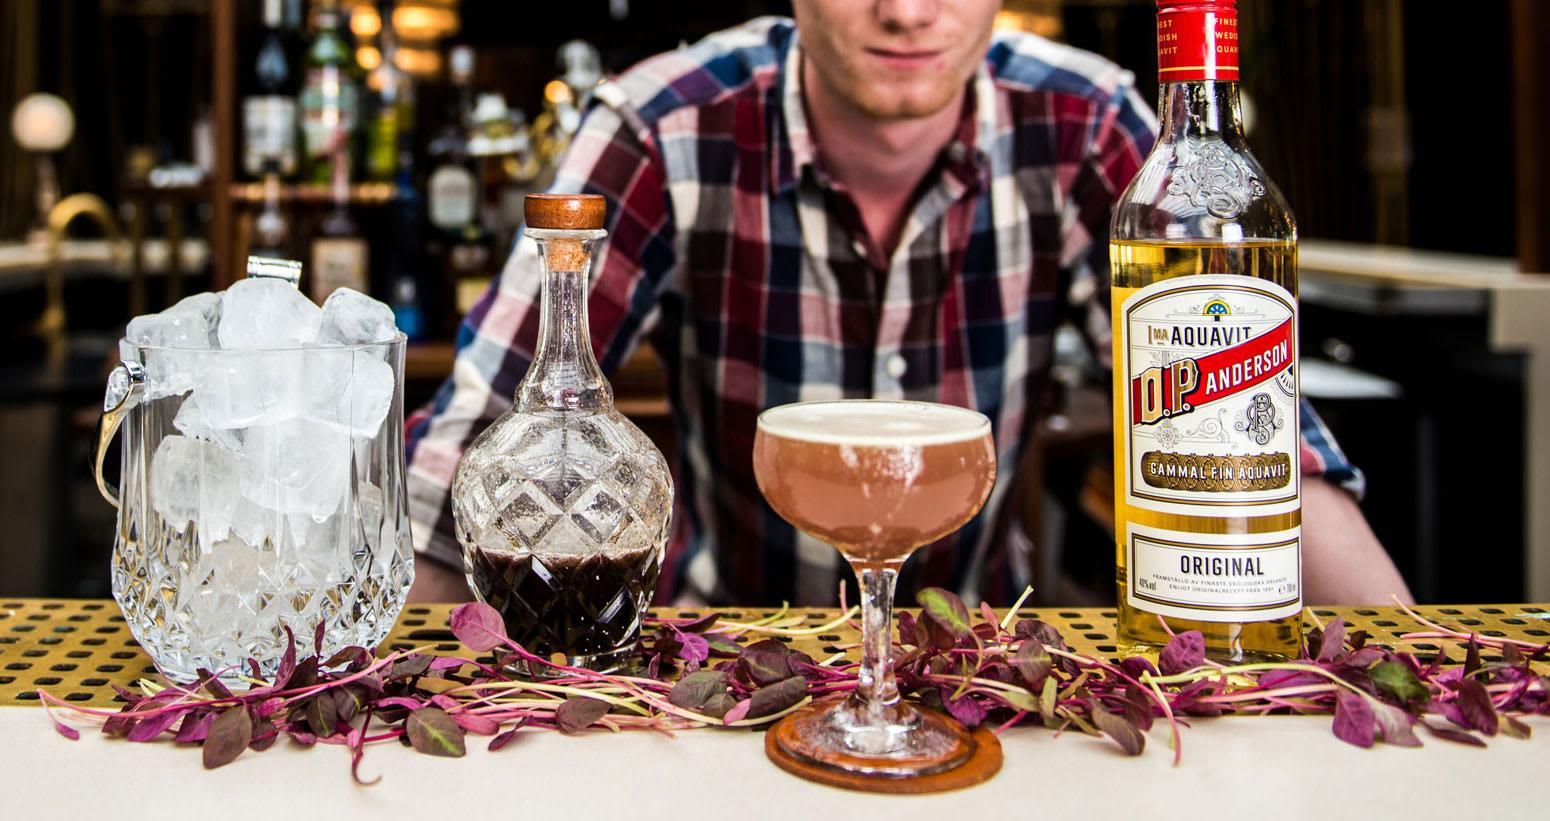 O.P. Anderson aquavit cocktail